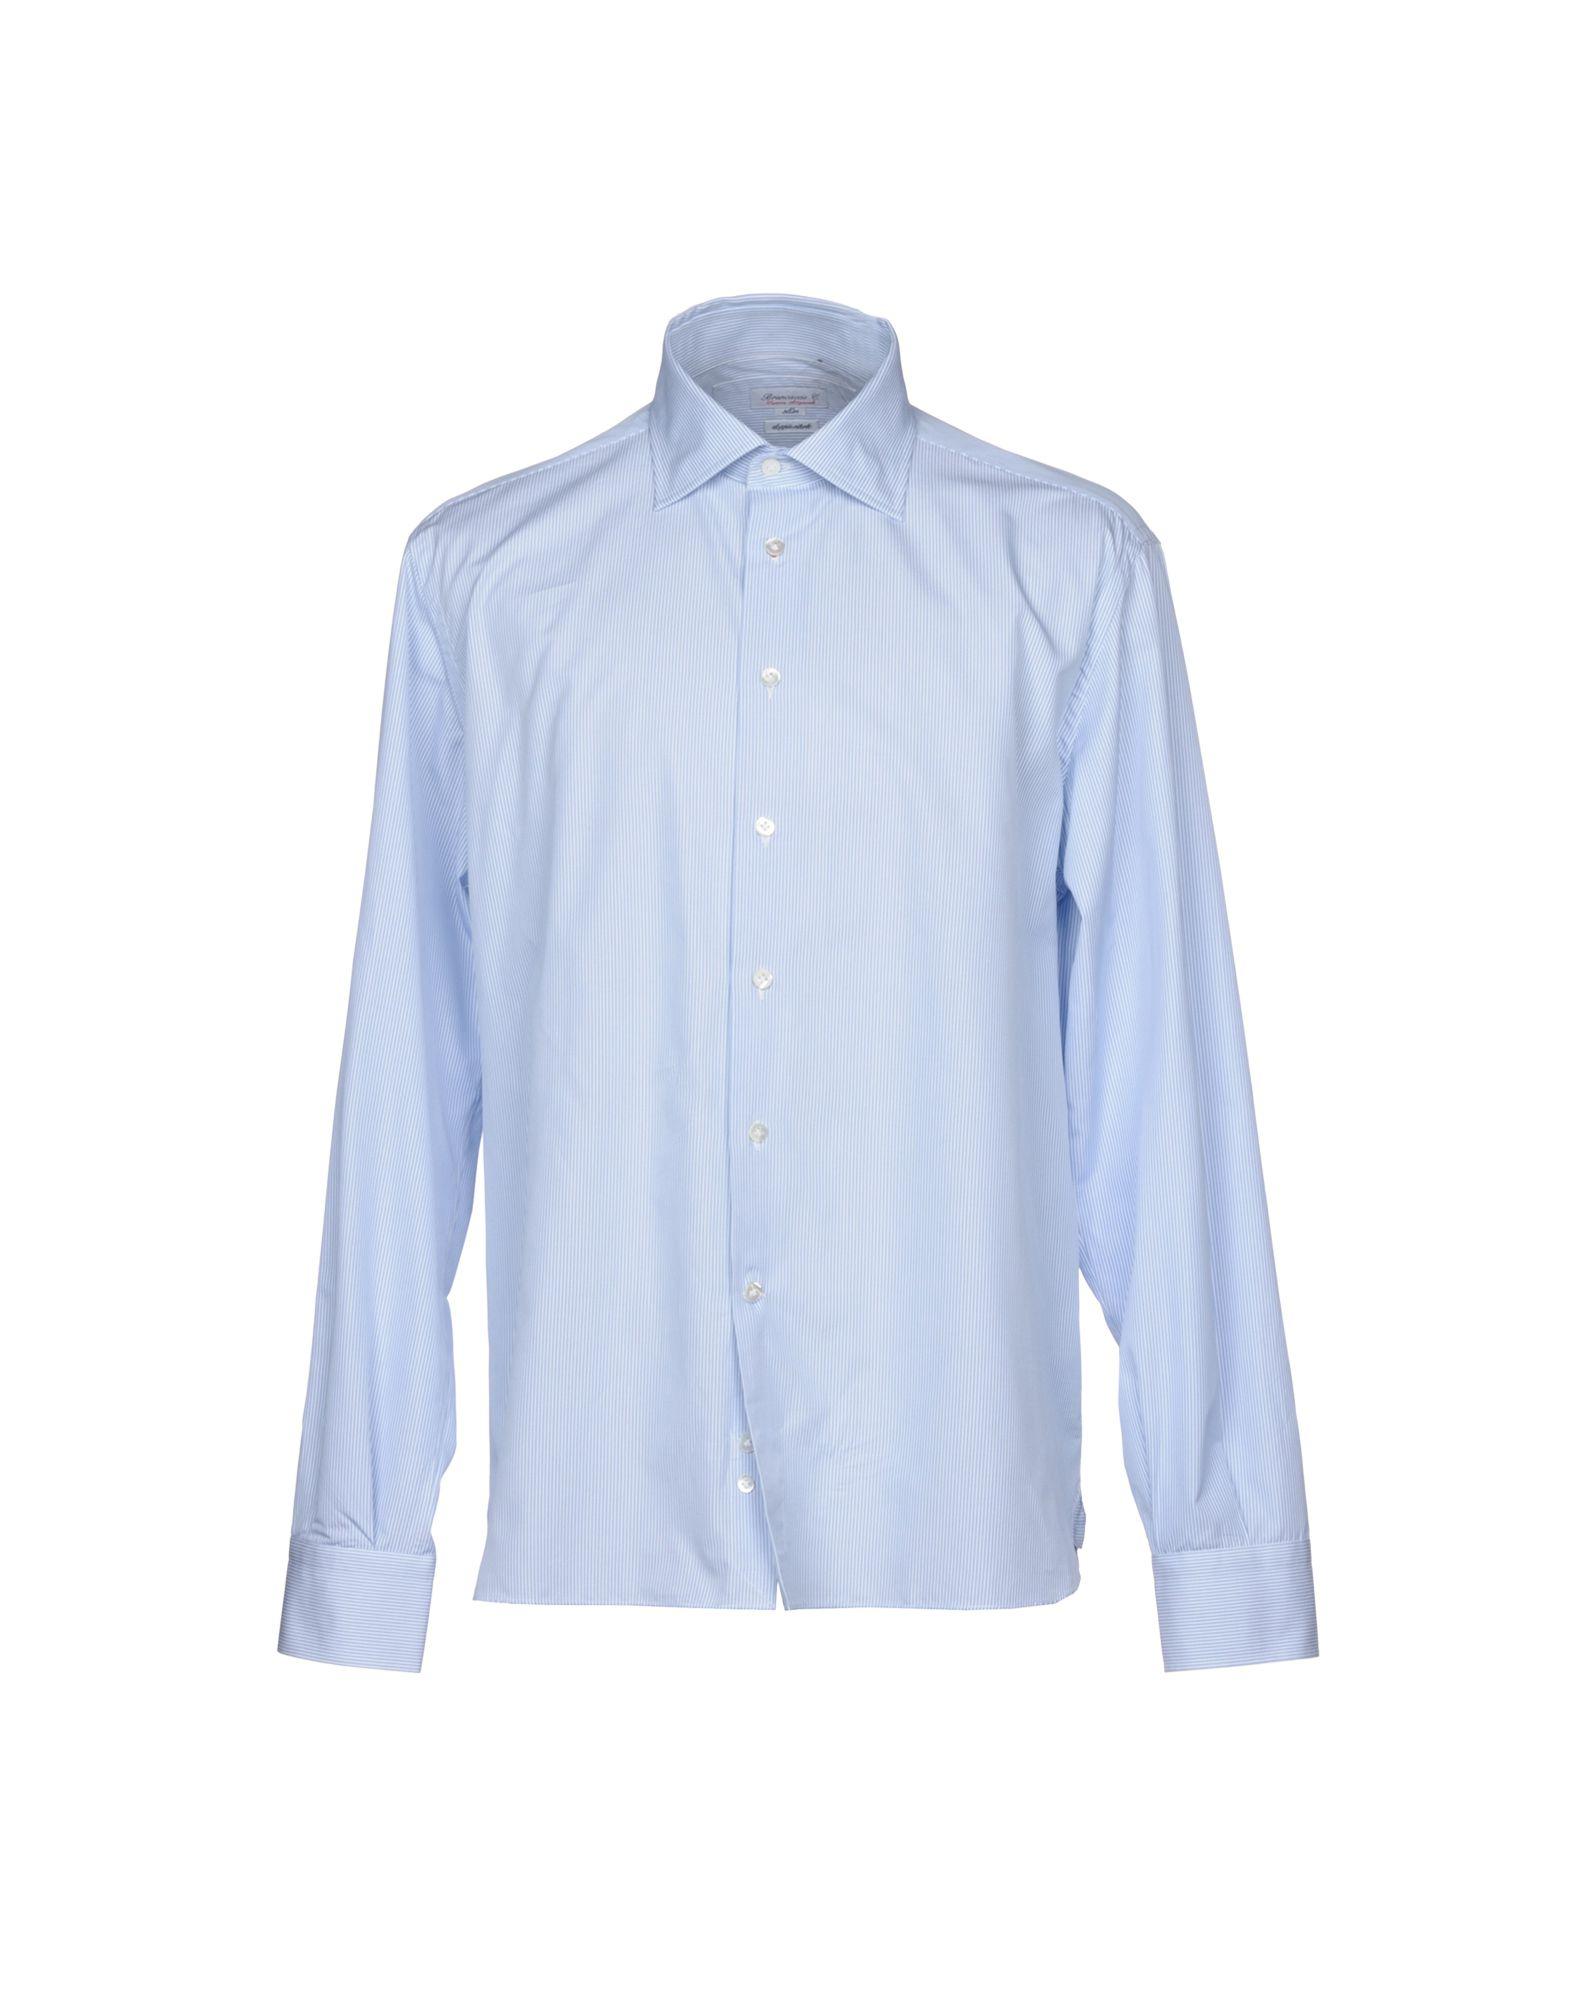 Brancaccio Shirts SHIRTS